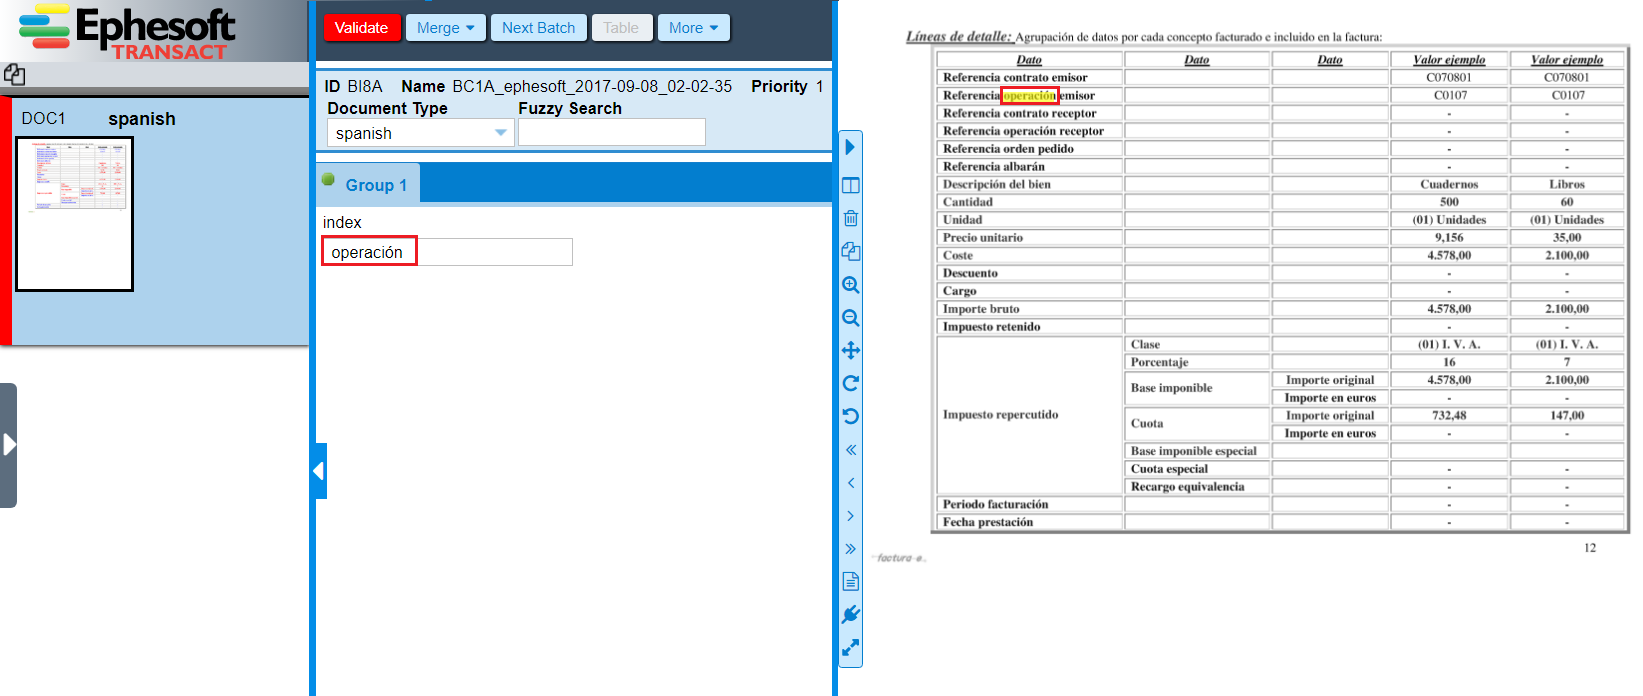 C:\Users\Ephesoft\AppData\Local\Microsoft\Windows\INetCache\Content.Word\21-1.png